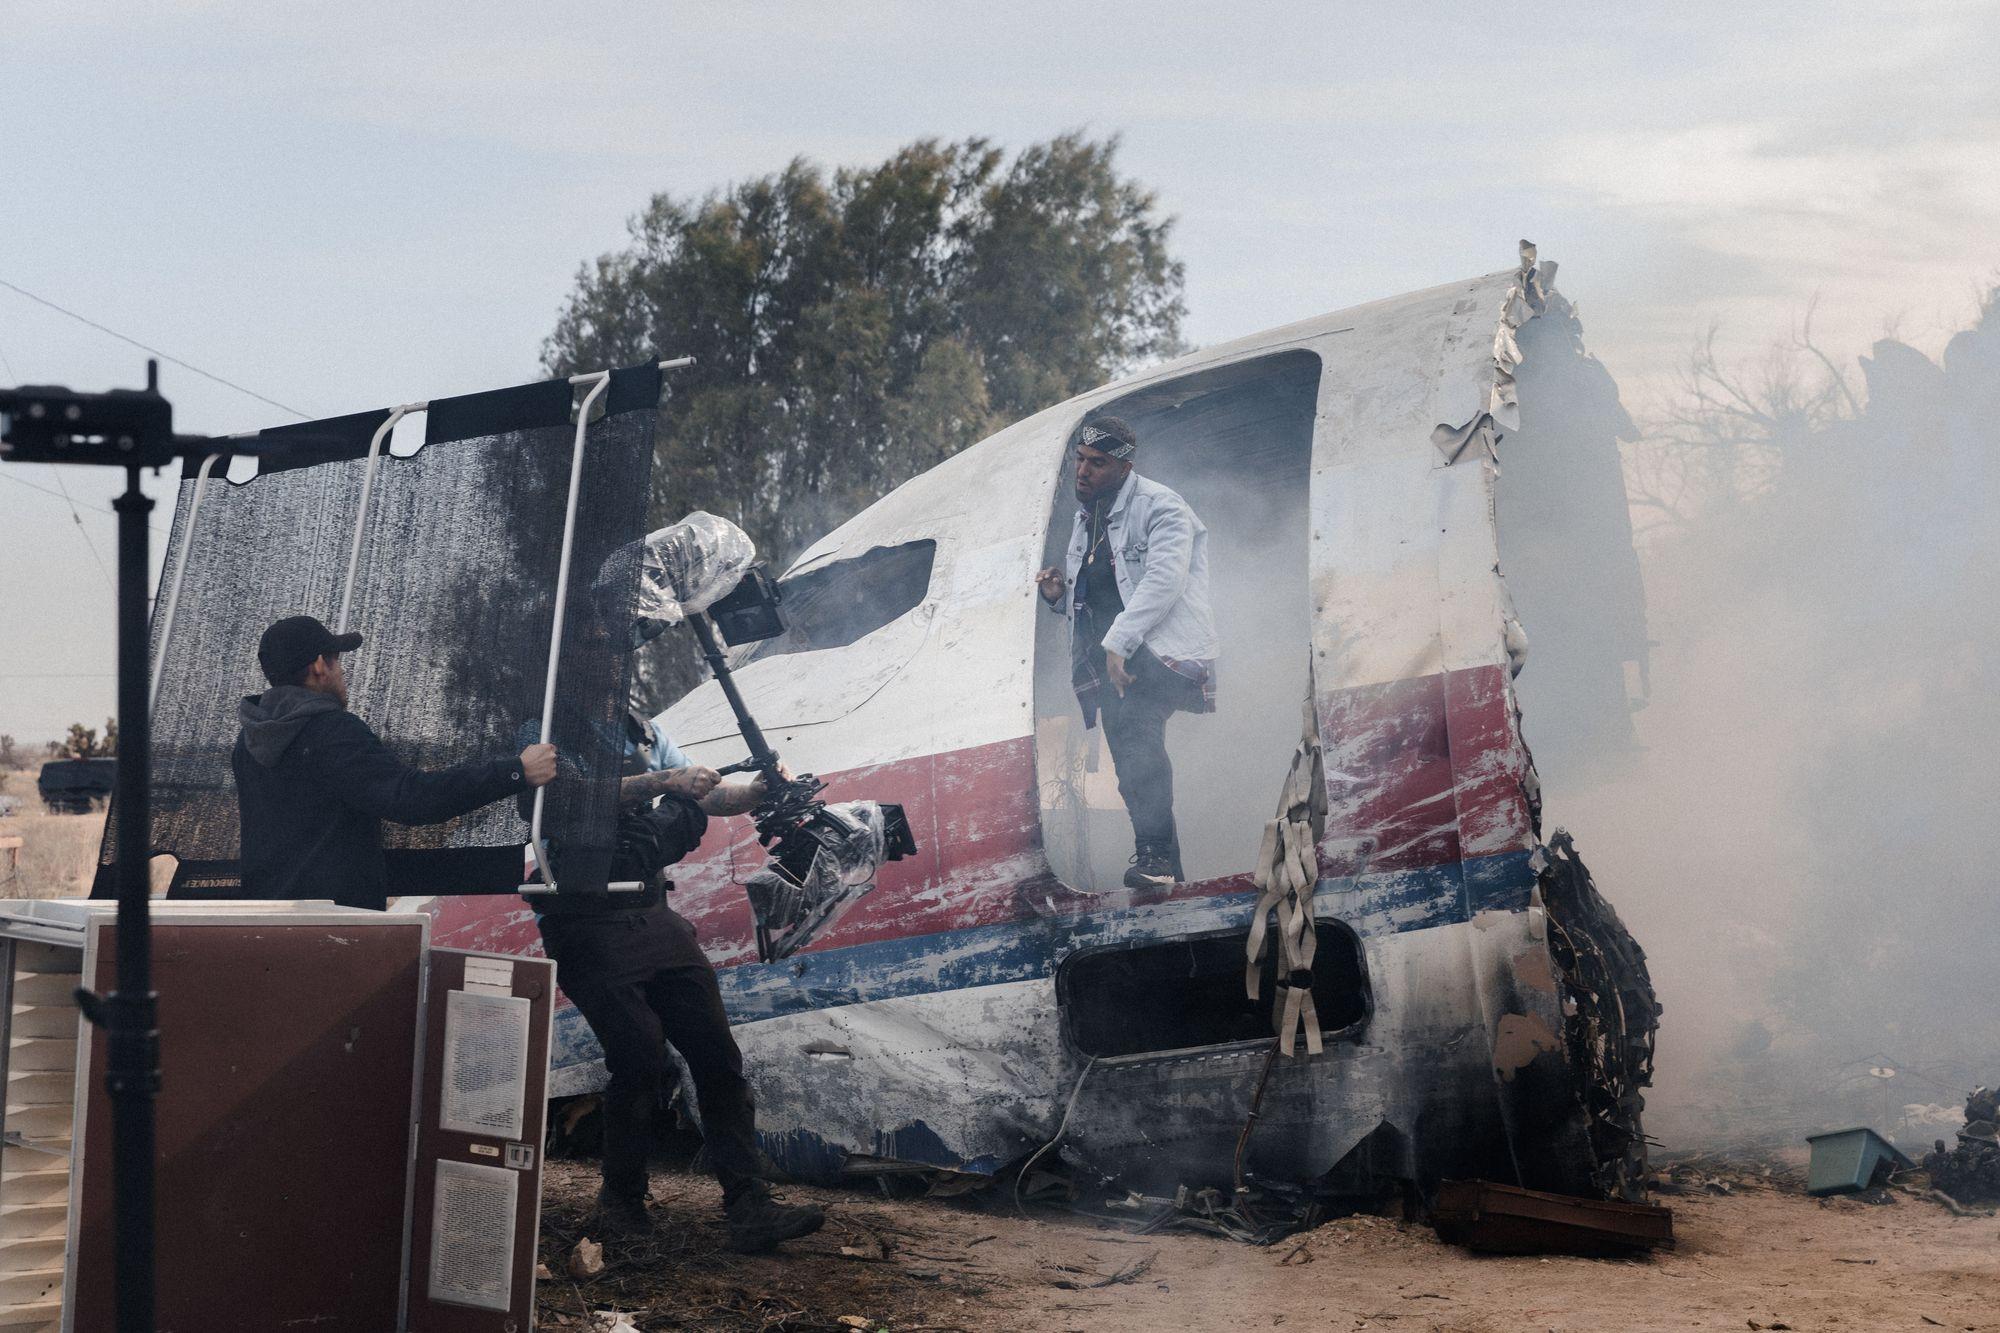 Creative music video shoot on a broken airplane